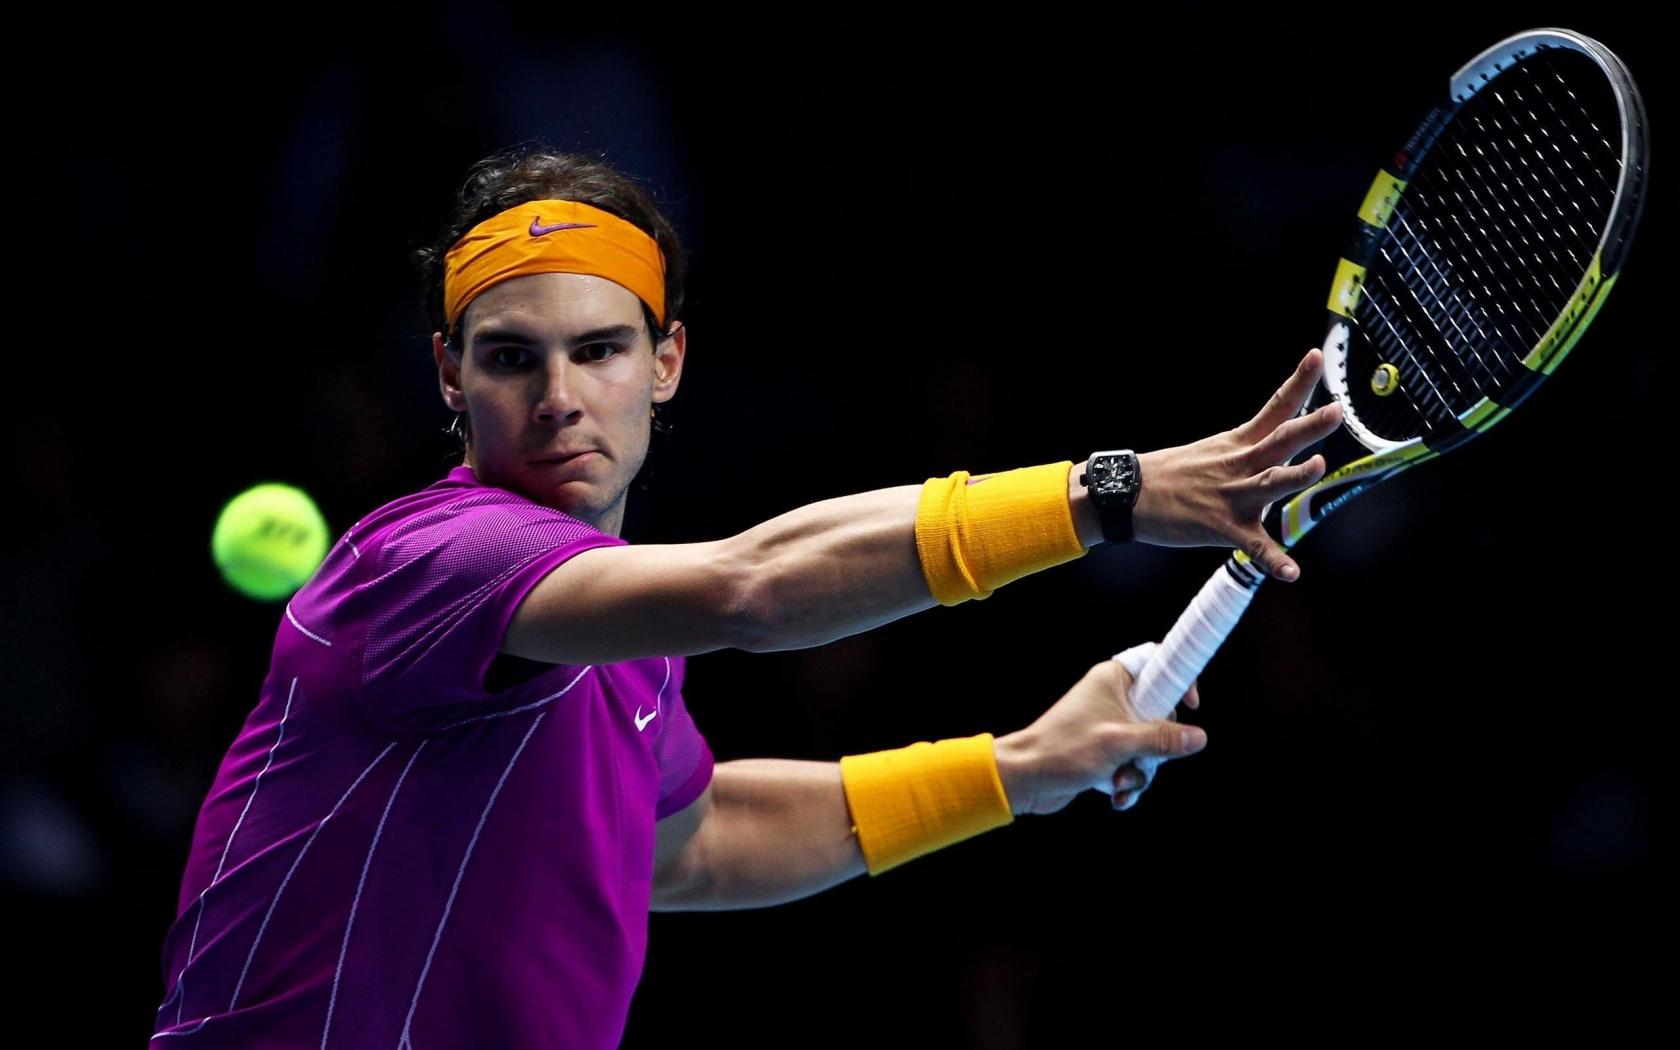 Теннисист ракетка теннисный мяч